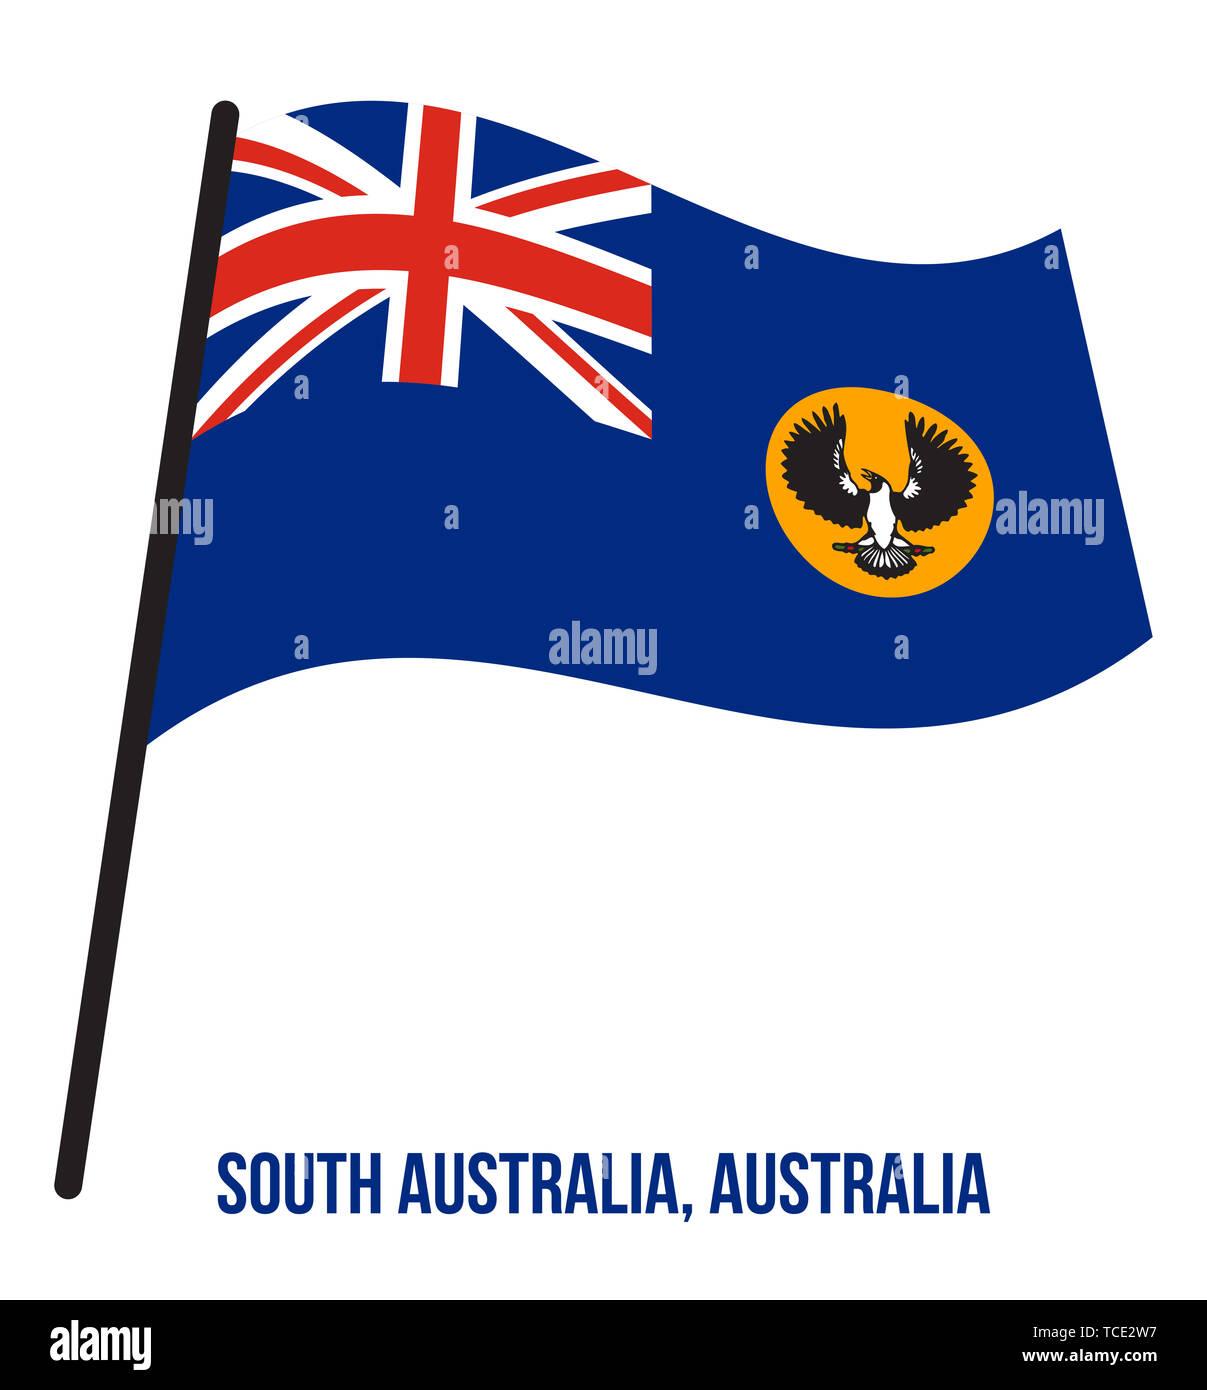 South Australia (SA) Flag Waving Vector Illustration on White Background. States Flag of Australia. - Stock Image